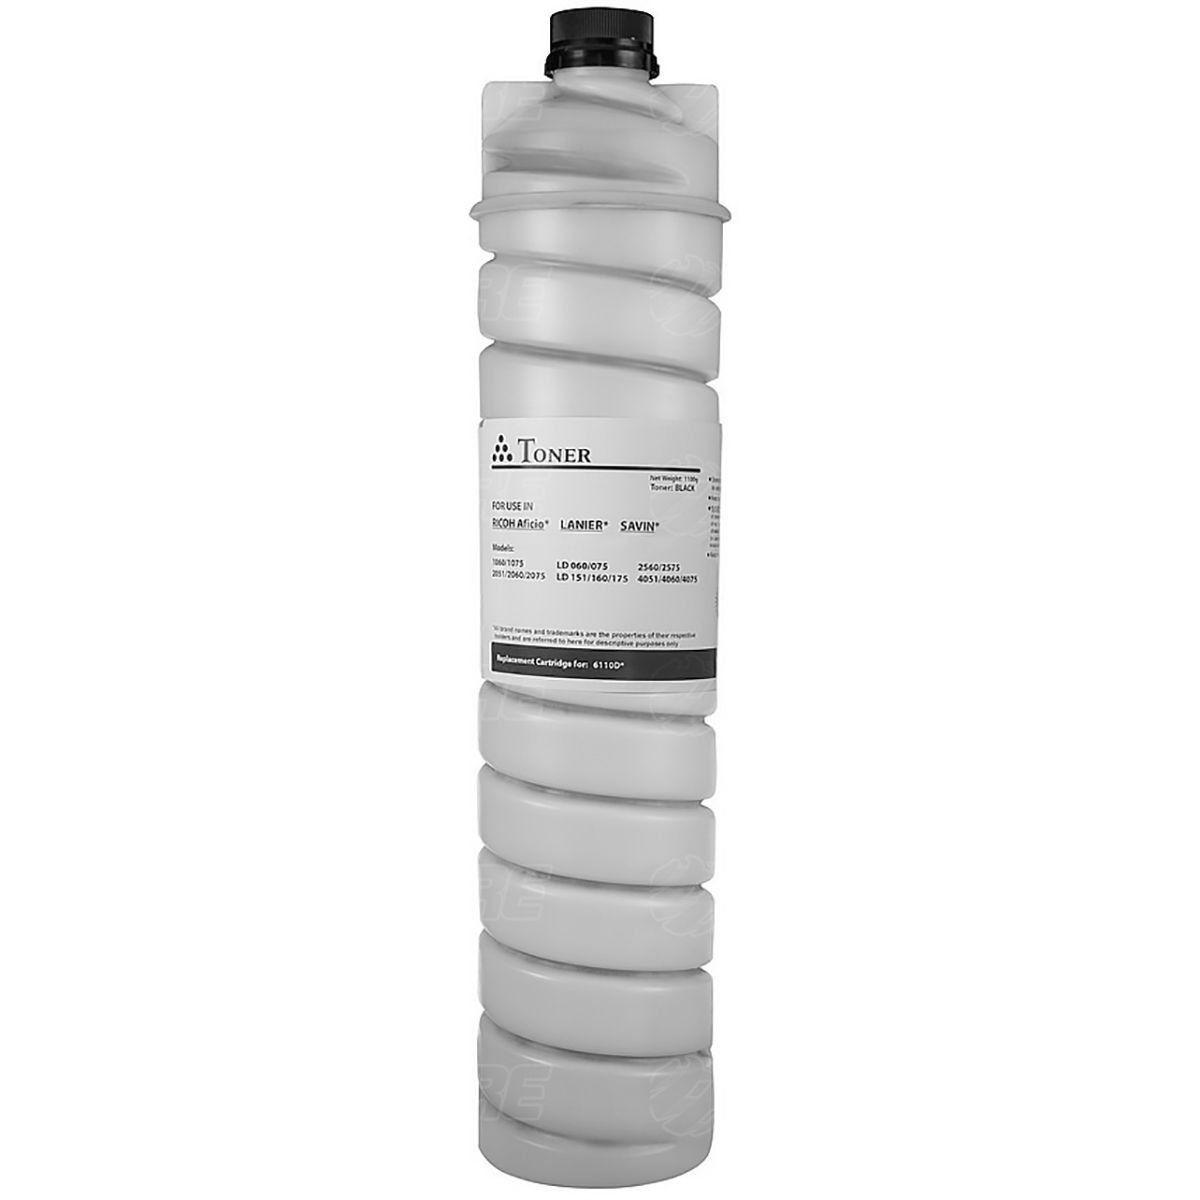 Compatível: Toner 1170D para Ricoh Aficio 1515 1515f 1515mf MP161 161f 161spf MP171 171f MP201 / Preto / 7.000